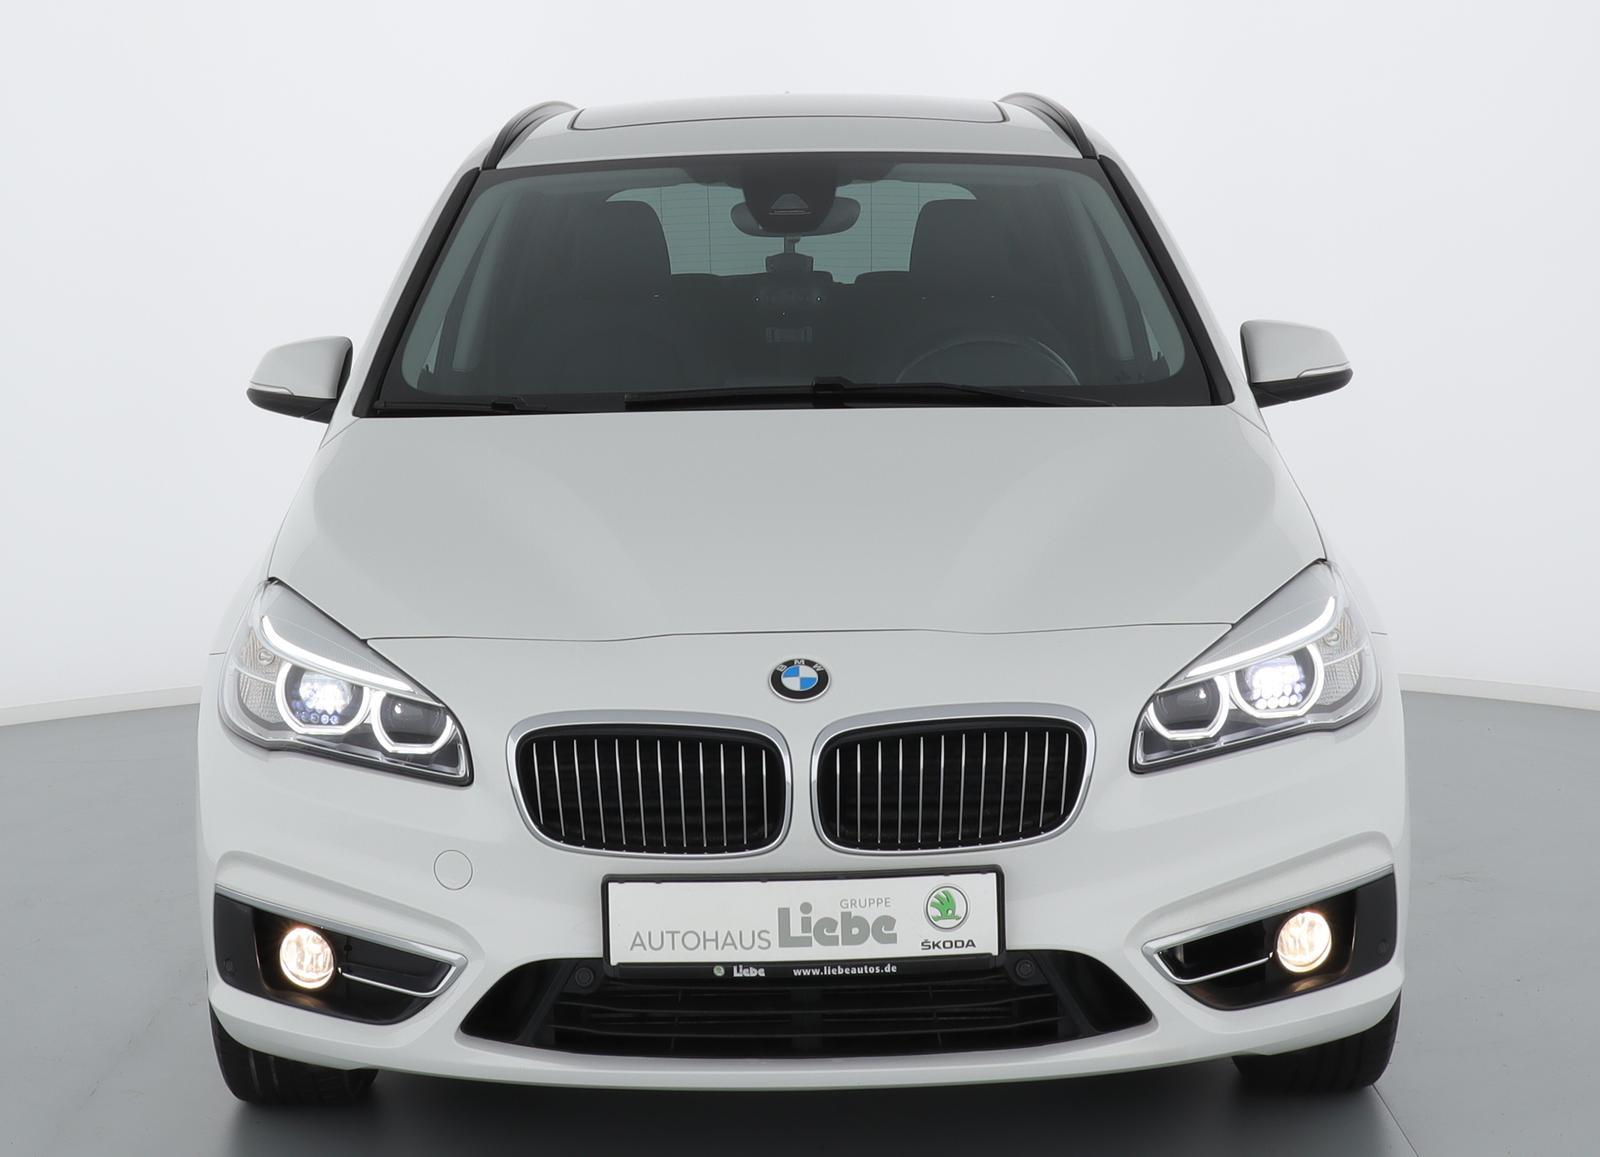 BMW 220d LUXURY LINE AUTOMATIK PANO+KAMERA+NAVI+LED, Jahr 2017, Diesel